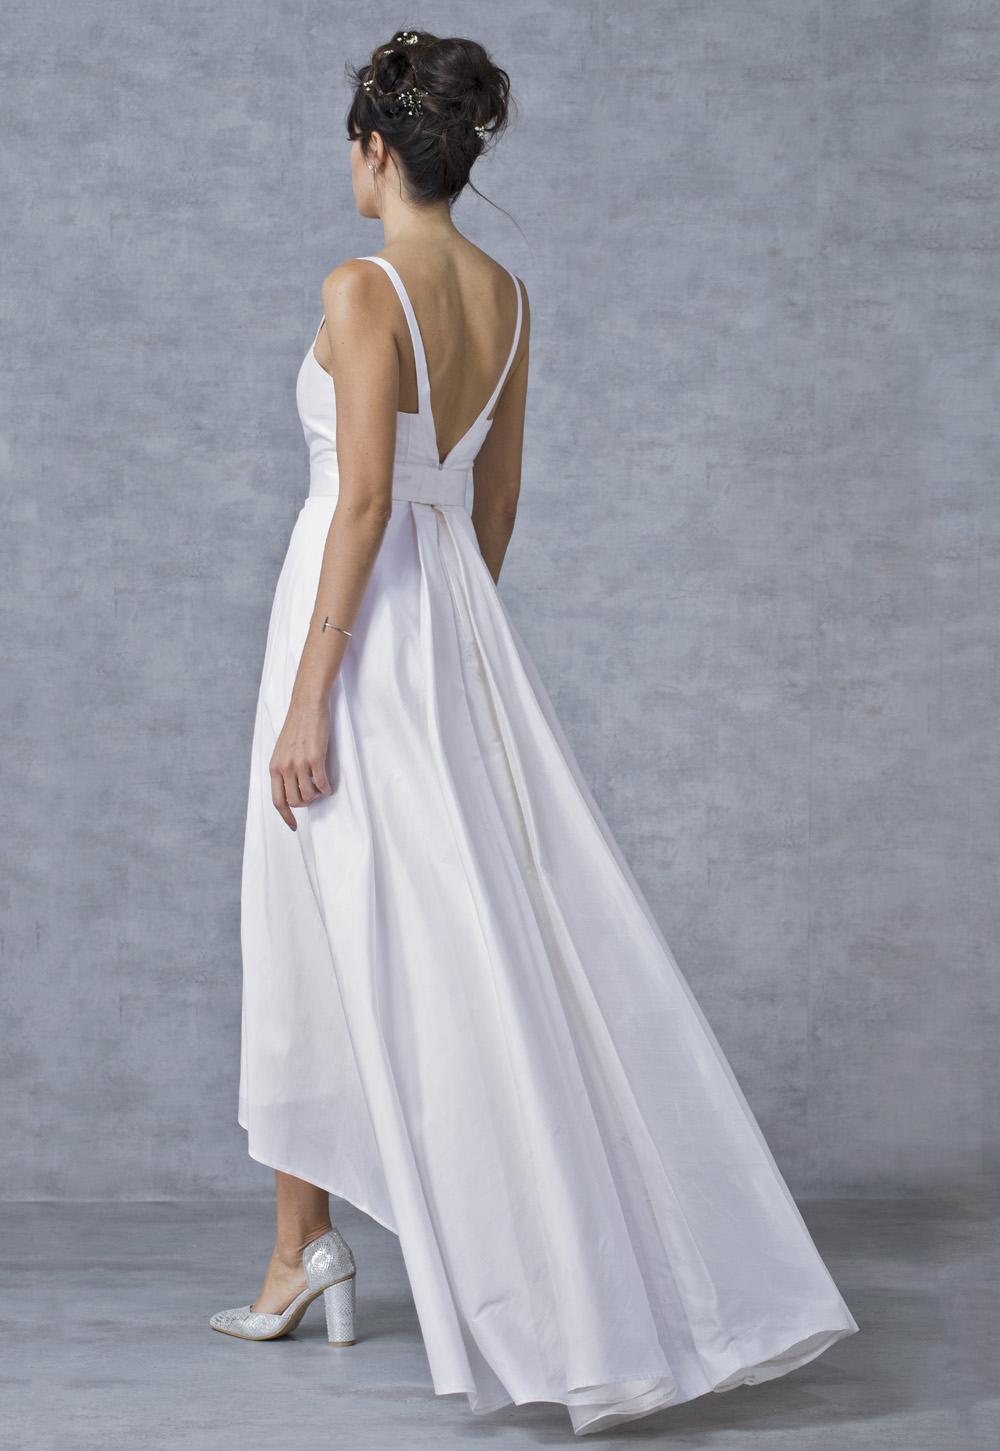 I3A9698 שמלות כלה - שמלה